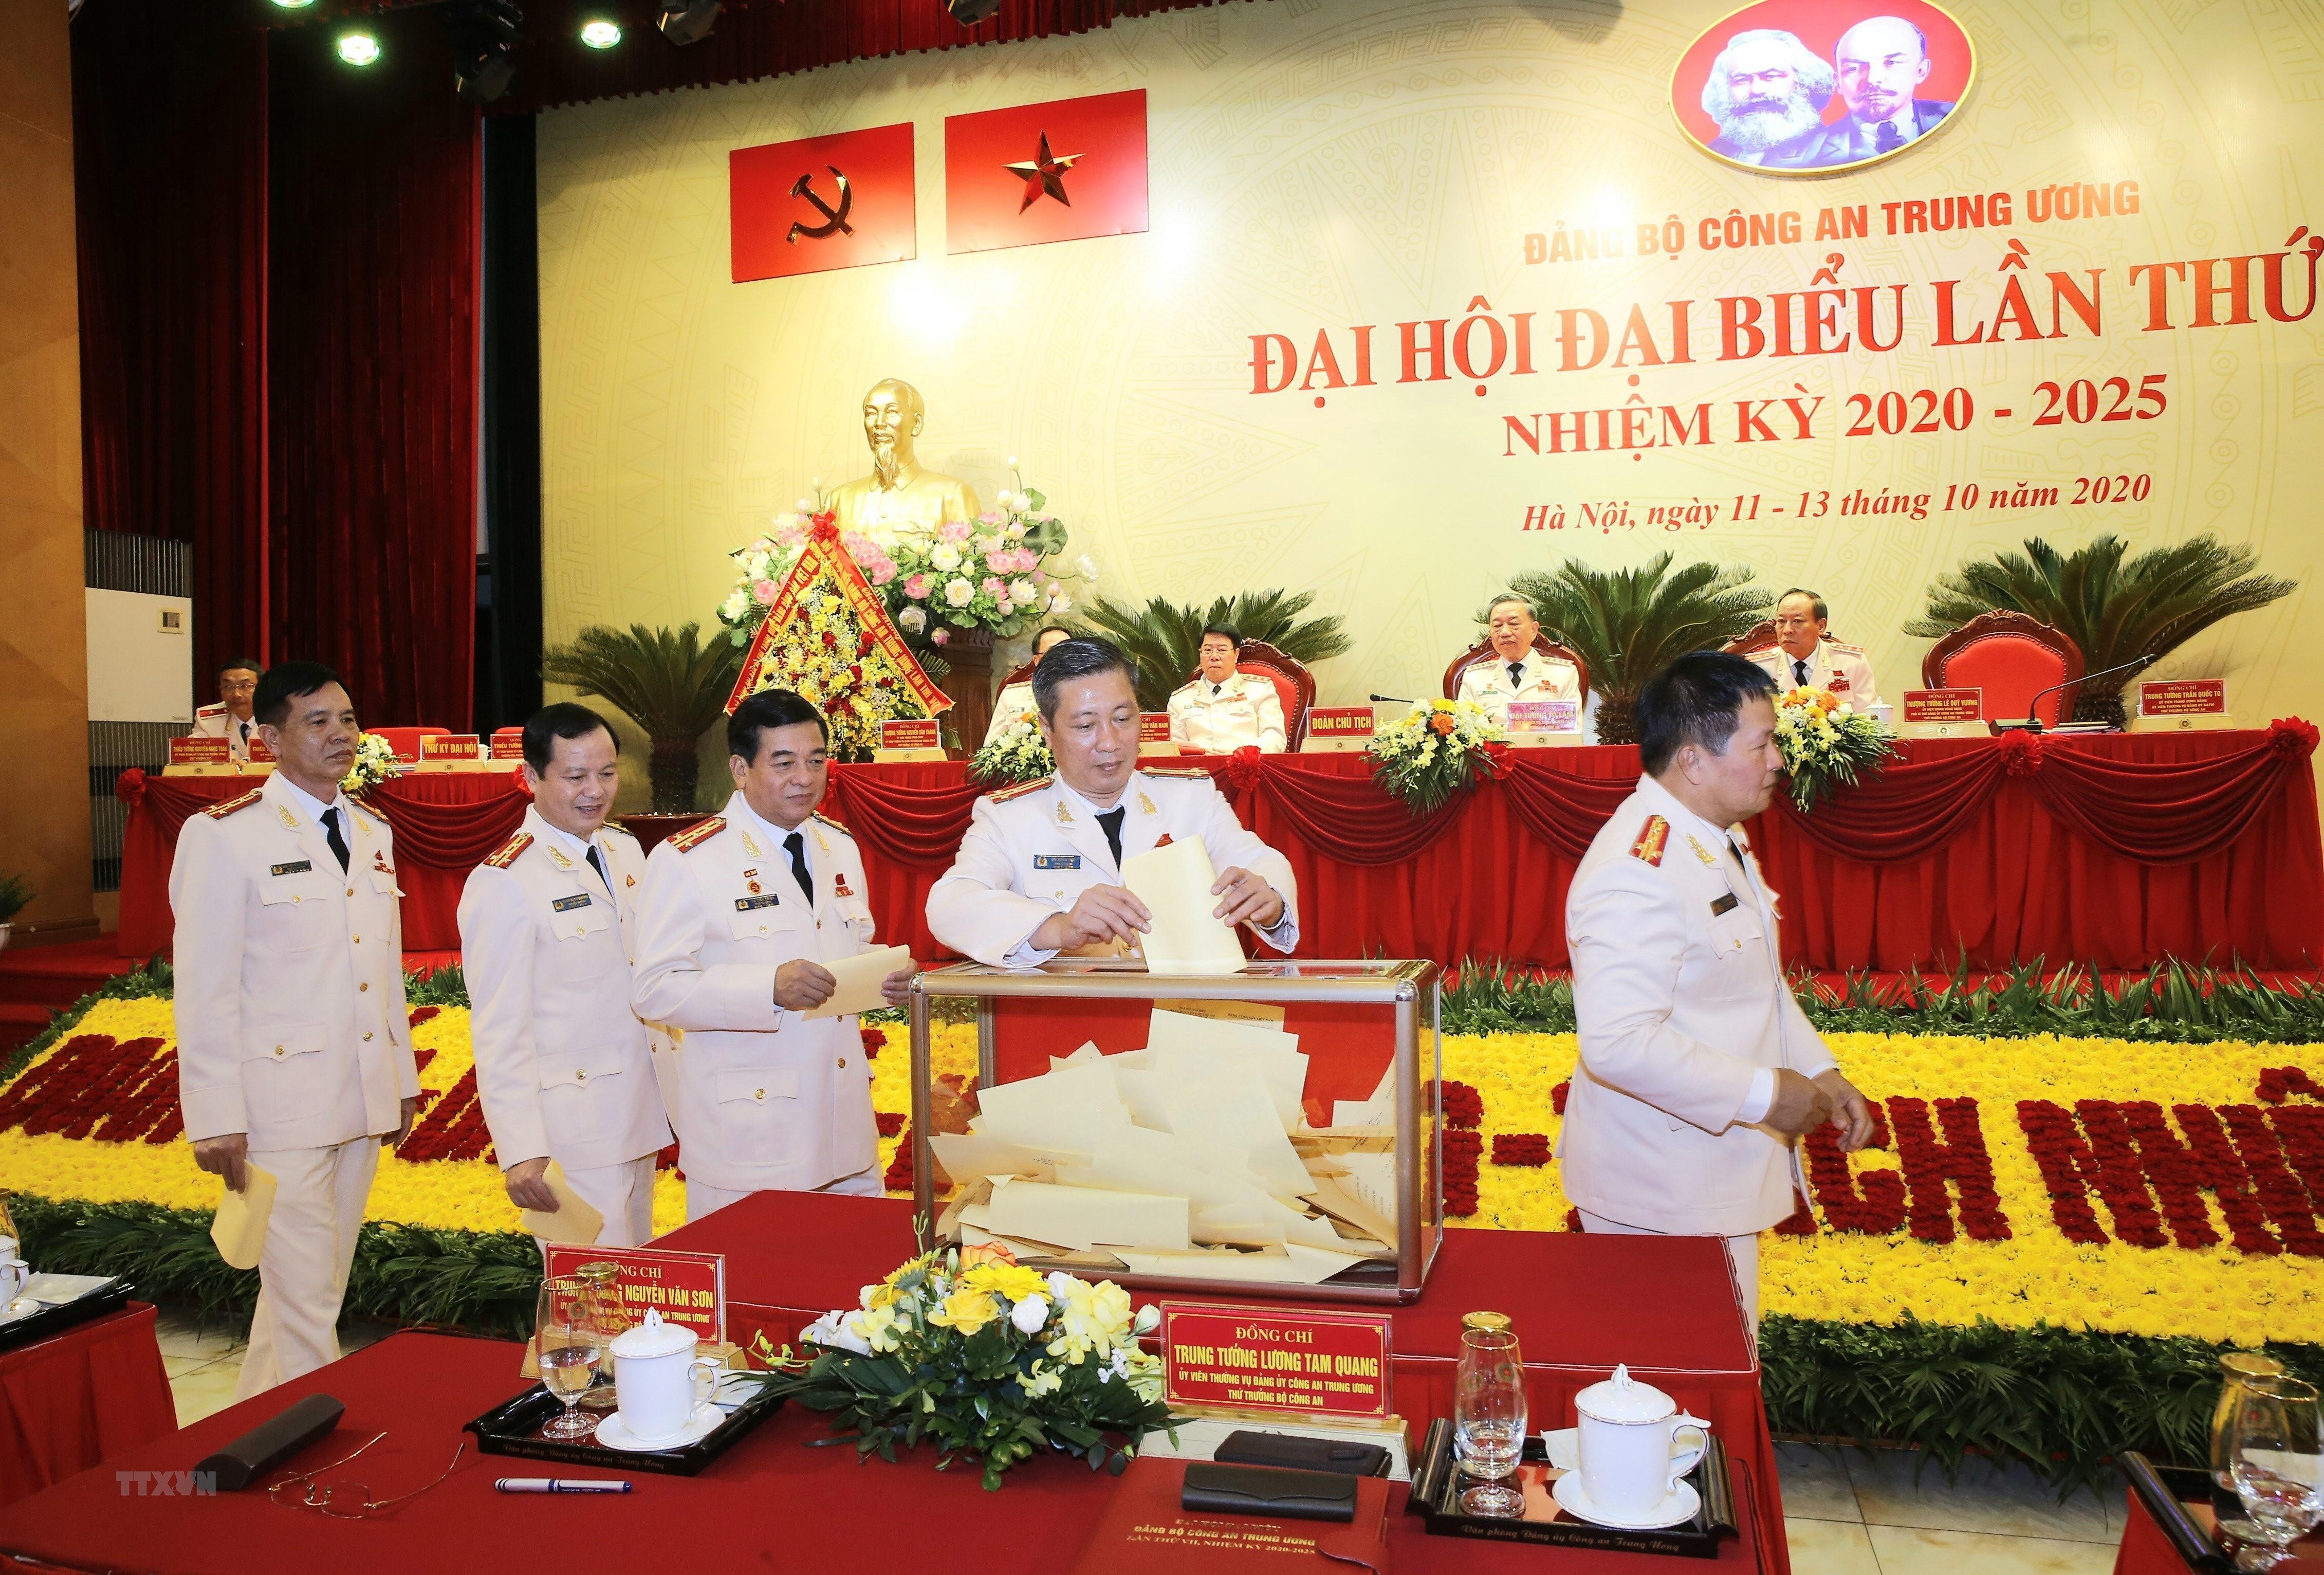 [Photo] Dai hoi dai bieu Dang bo Cong an Trung uong lan thu VII hinh anh 6